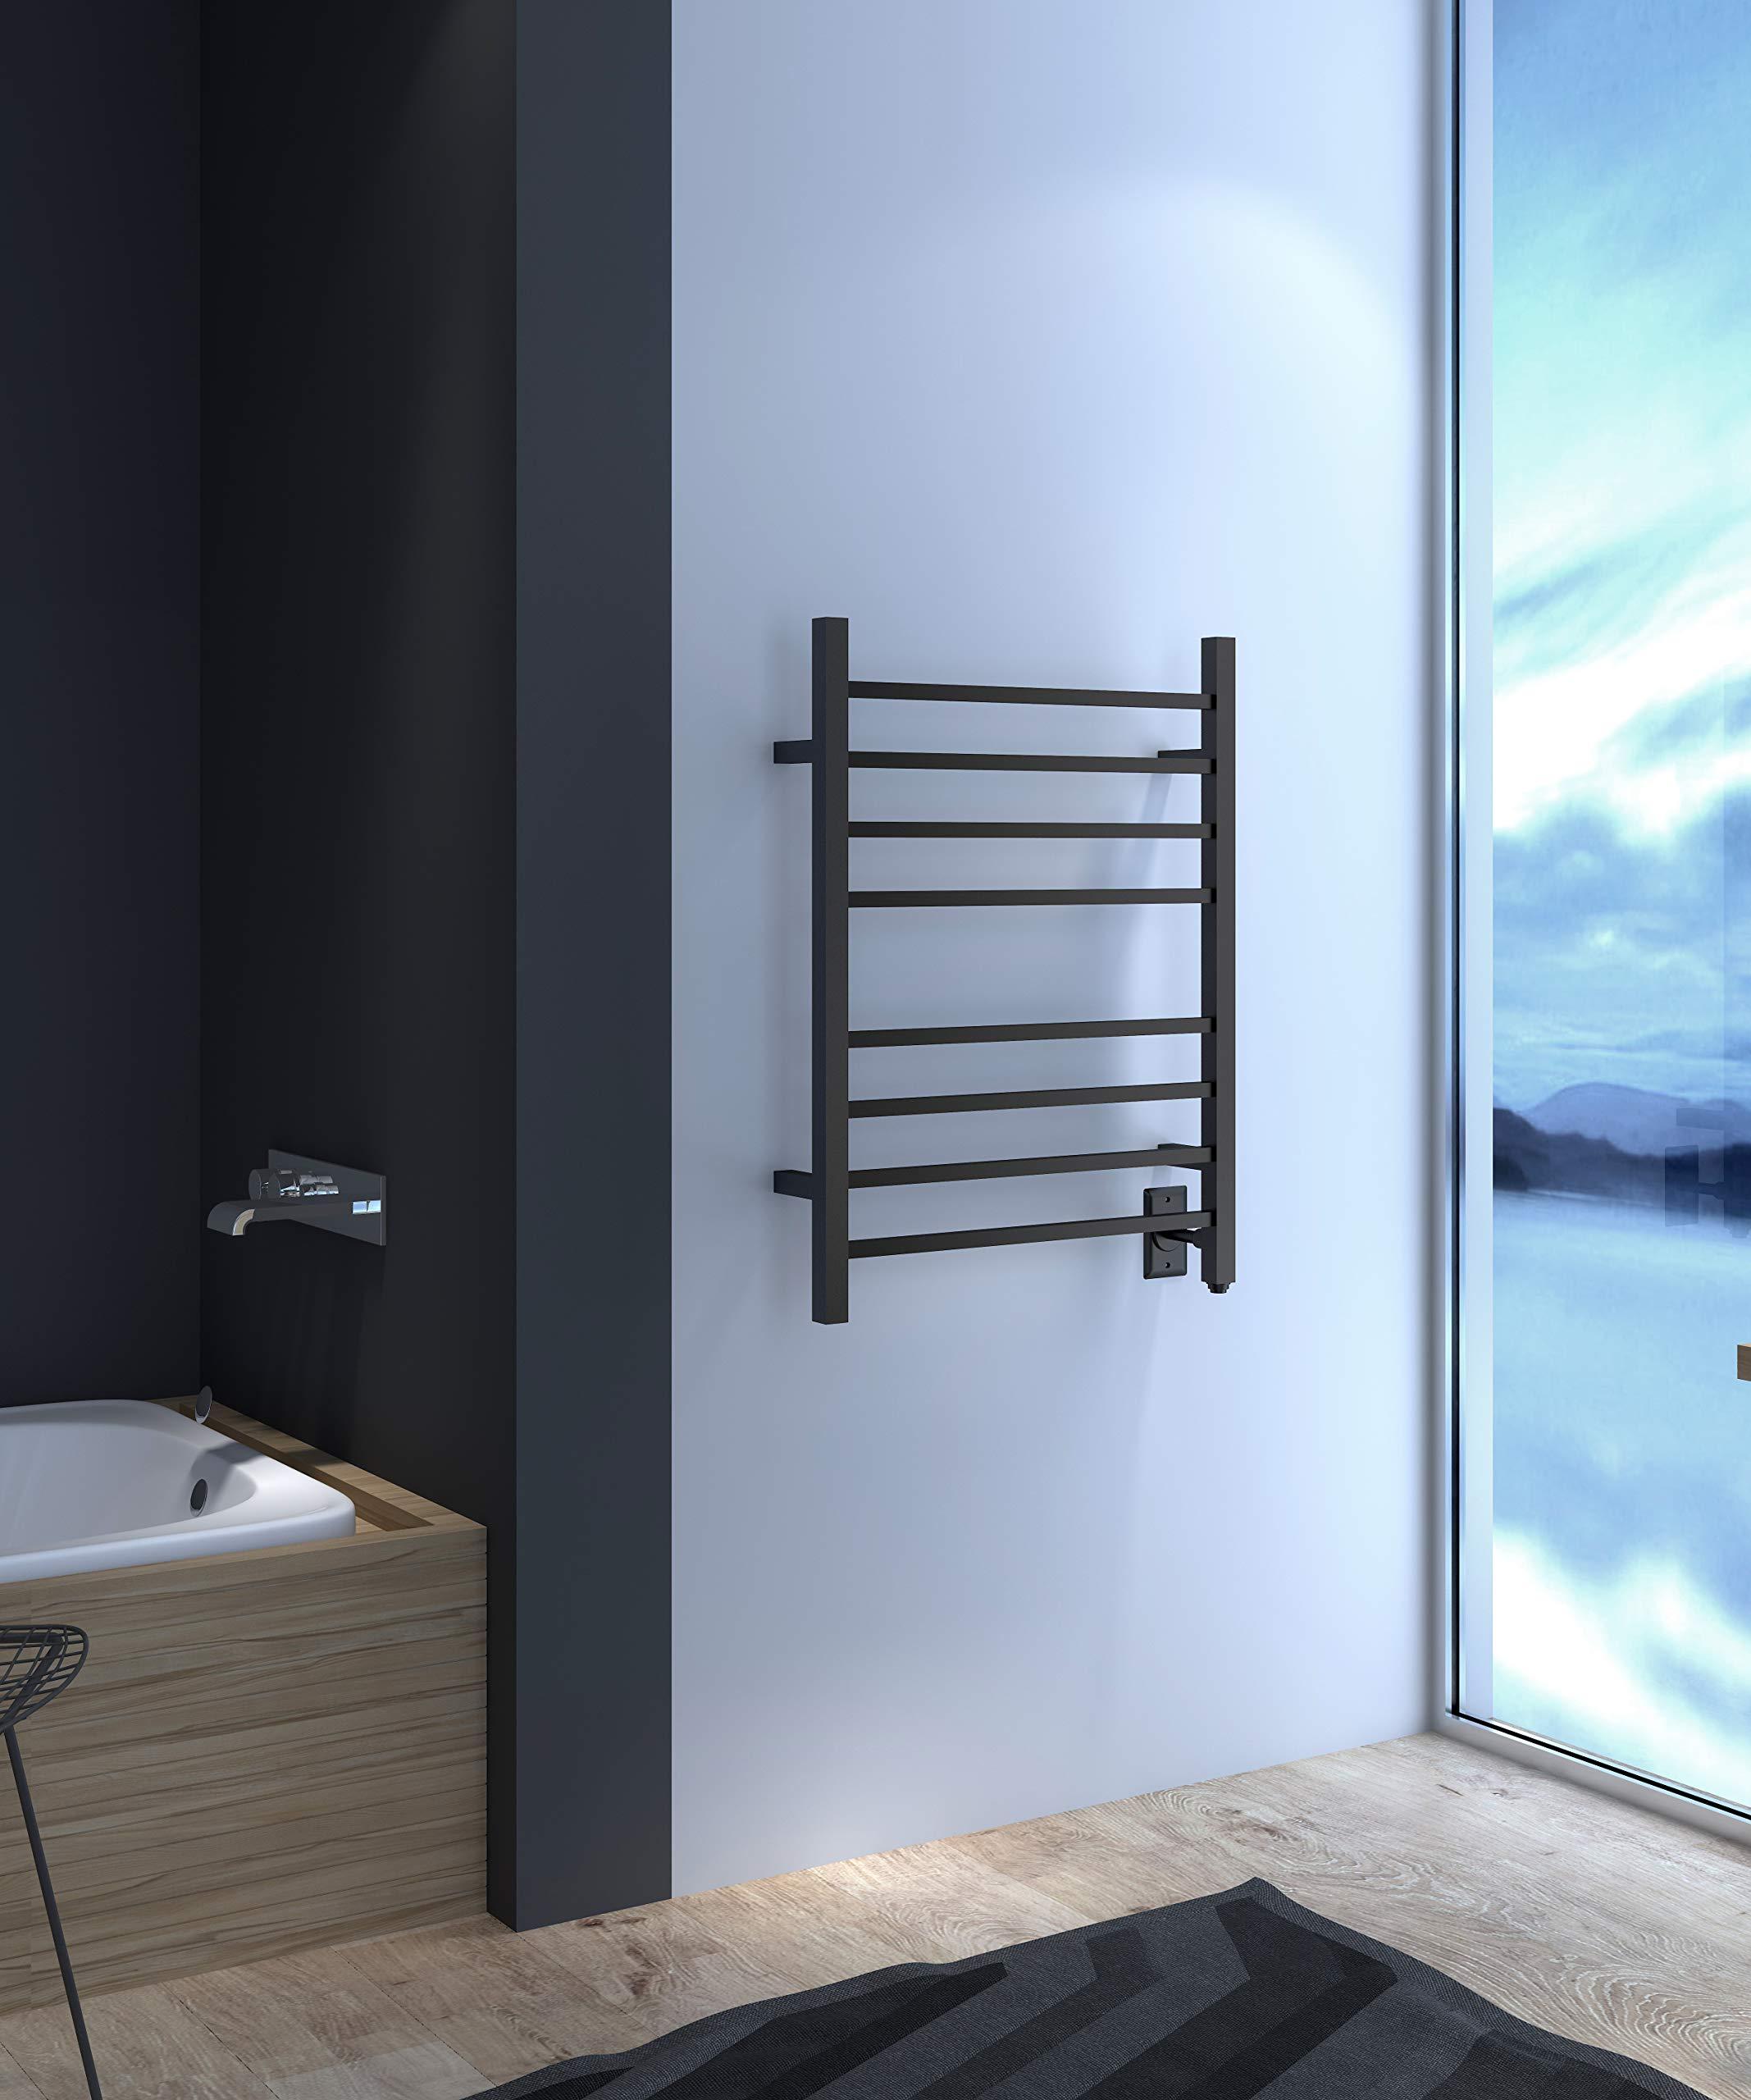 HEATGENE Hot Towel Warmer for Bath Heated Drying Rack 8 Square Bar Matte Black by HEATGENE (Image #6)